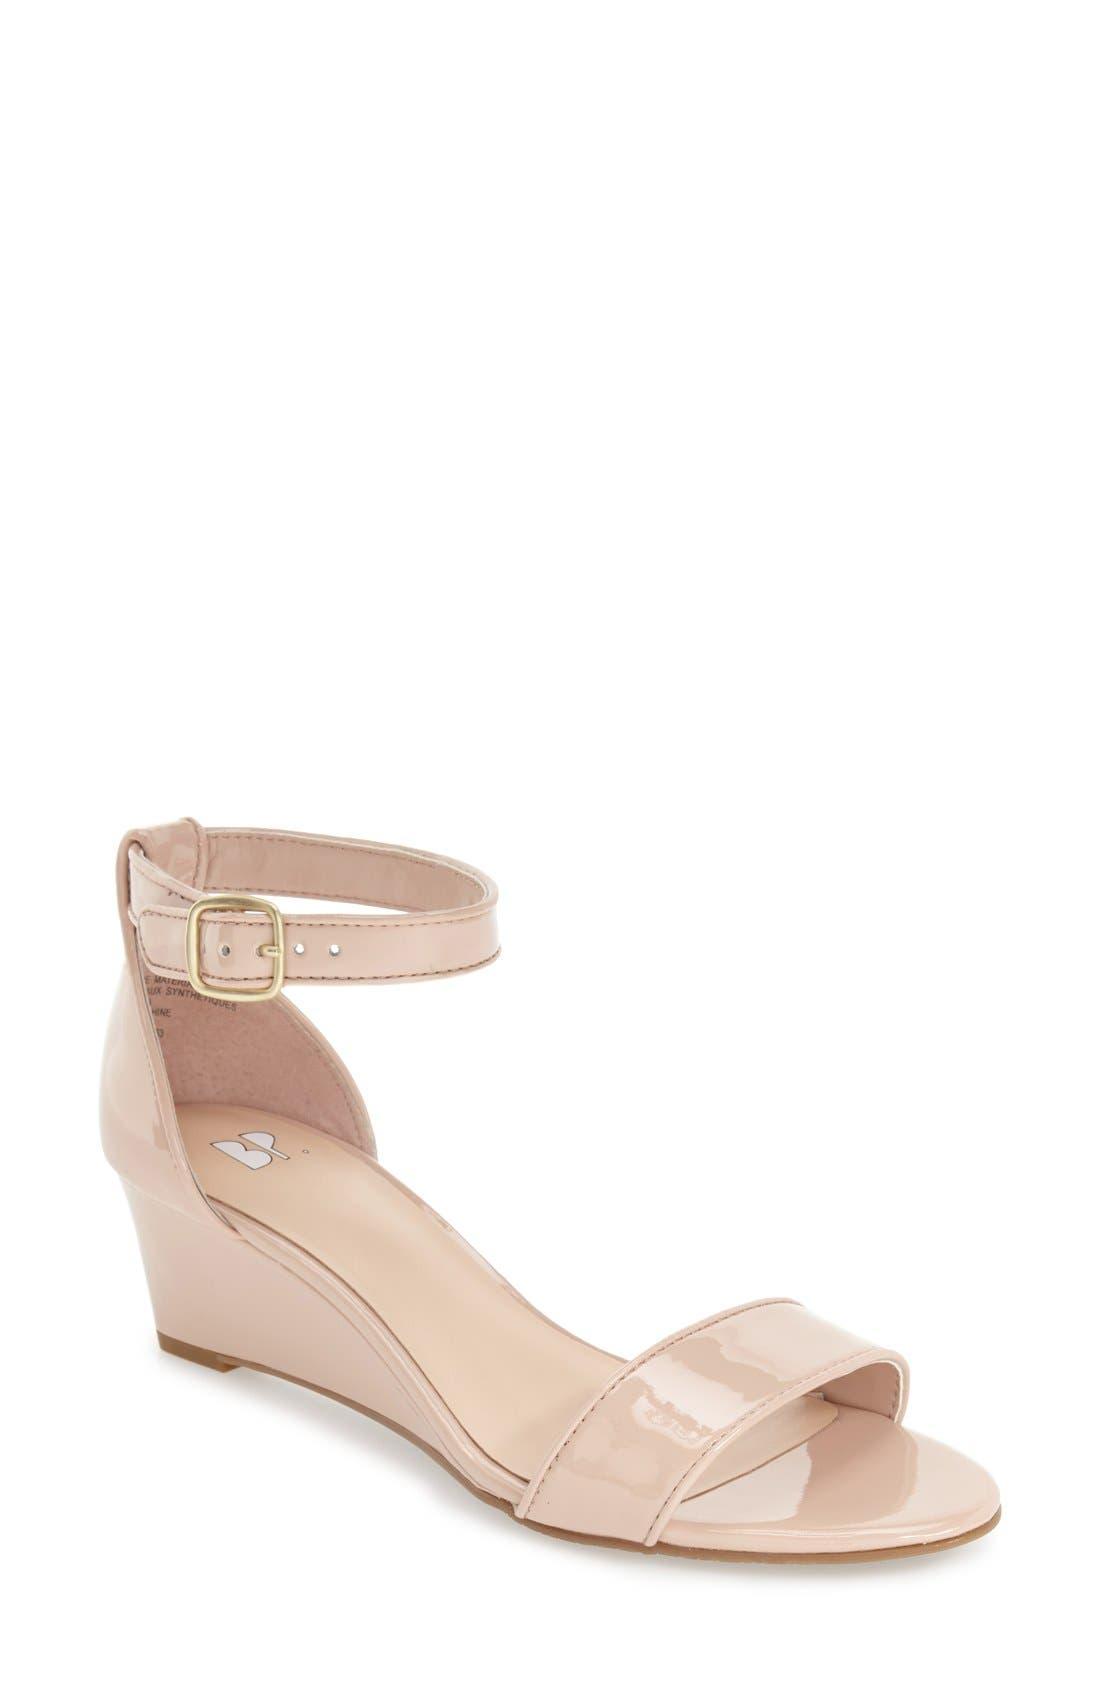 Main Image - BP. 'Roxie' Wedge Sandal (Women)